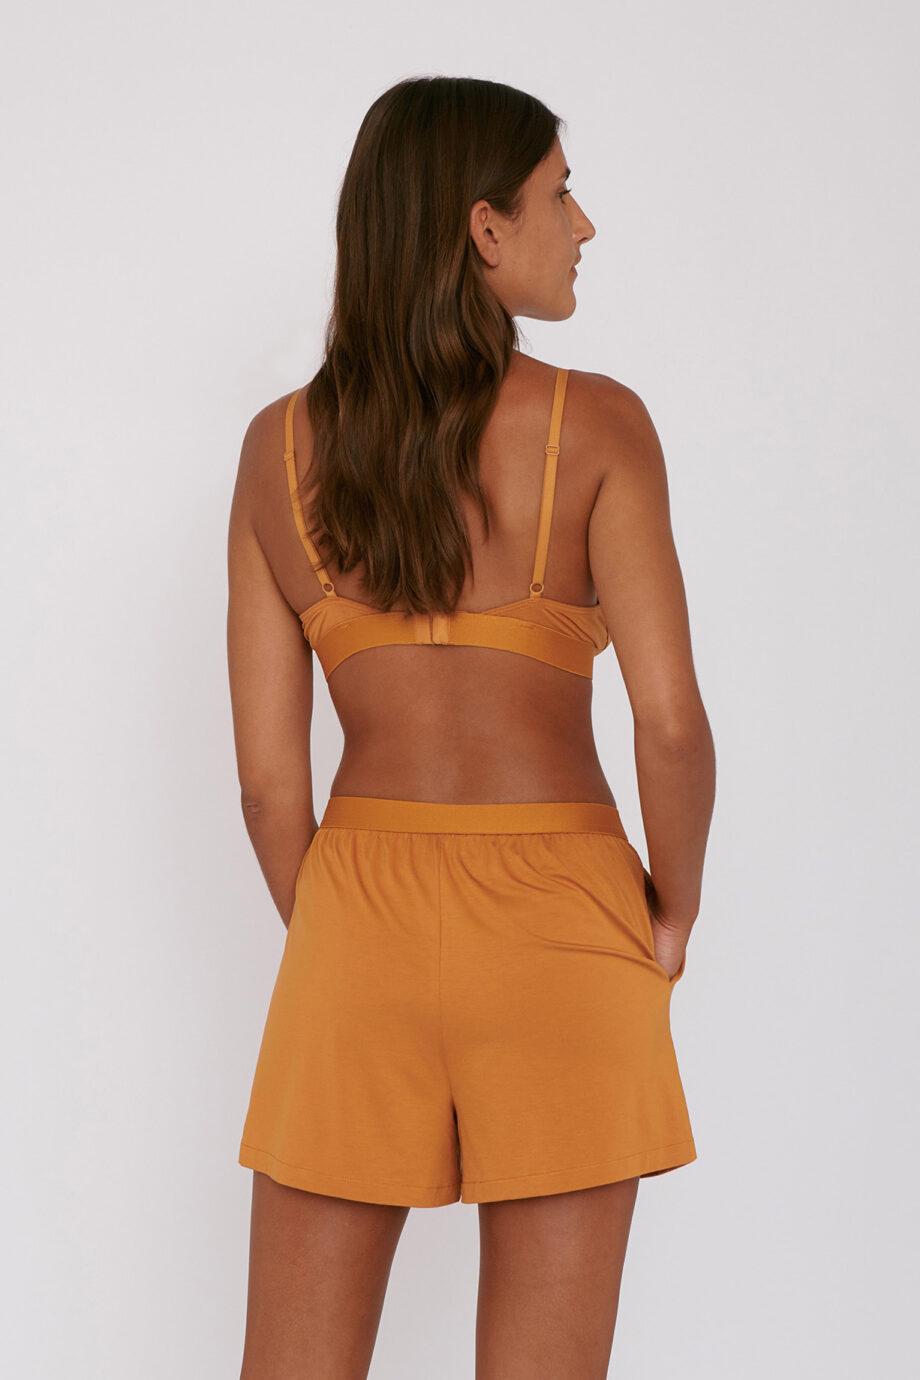 Organic Basics - shorts – geel_back